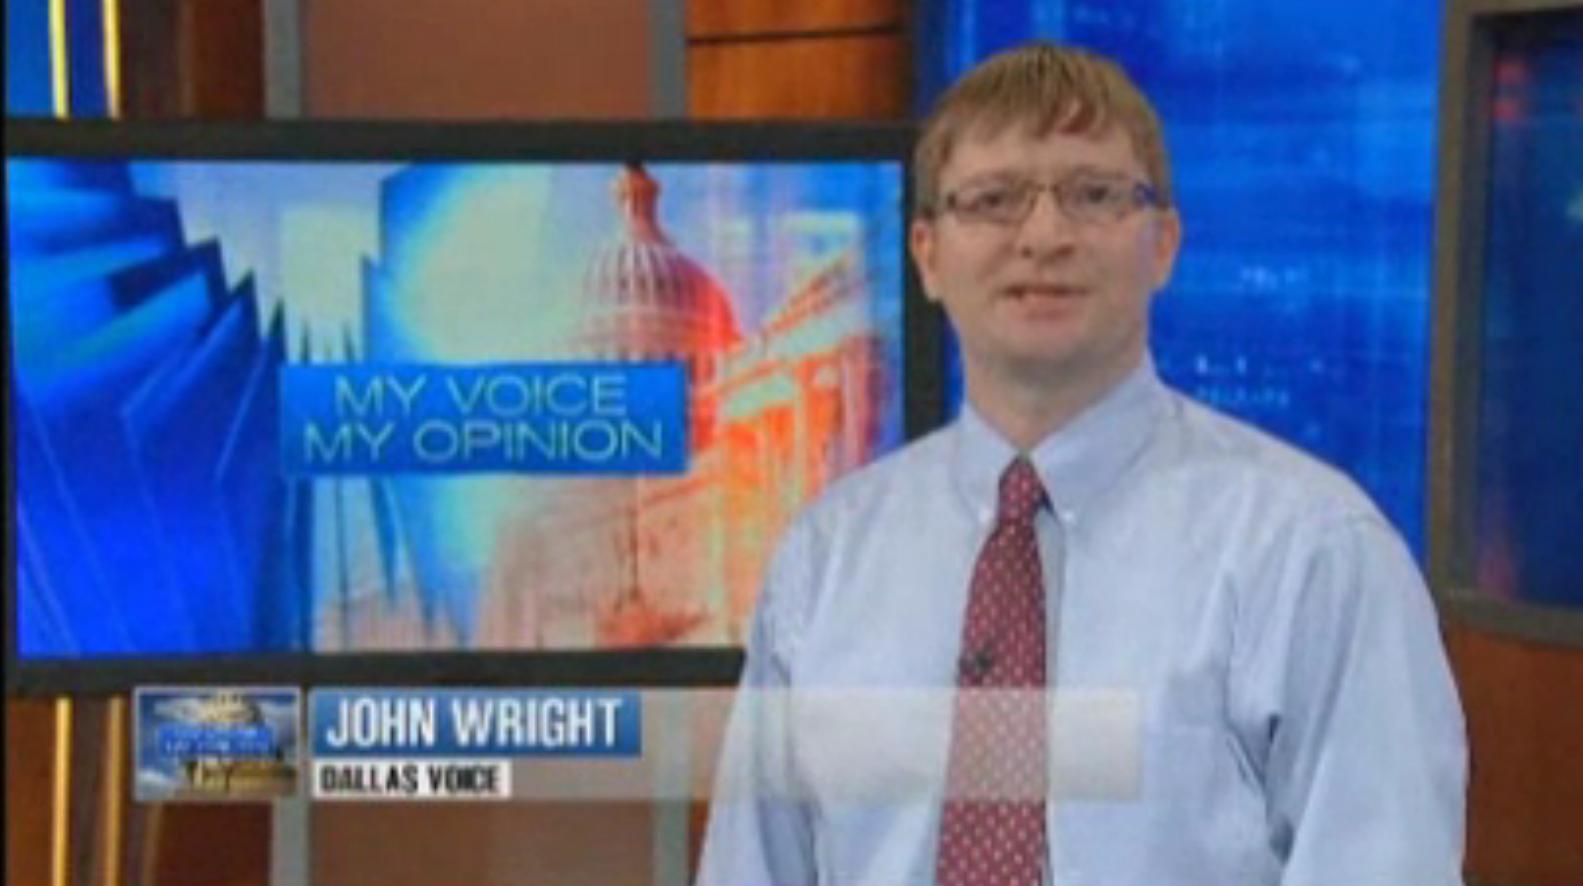 WATCH: Dallas Voice senior editor goes all up 'Inside Texas Politics'